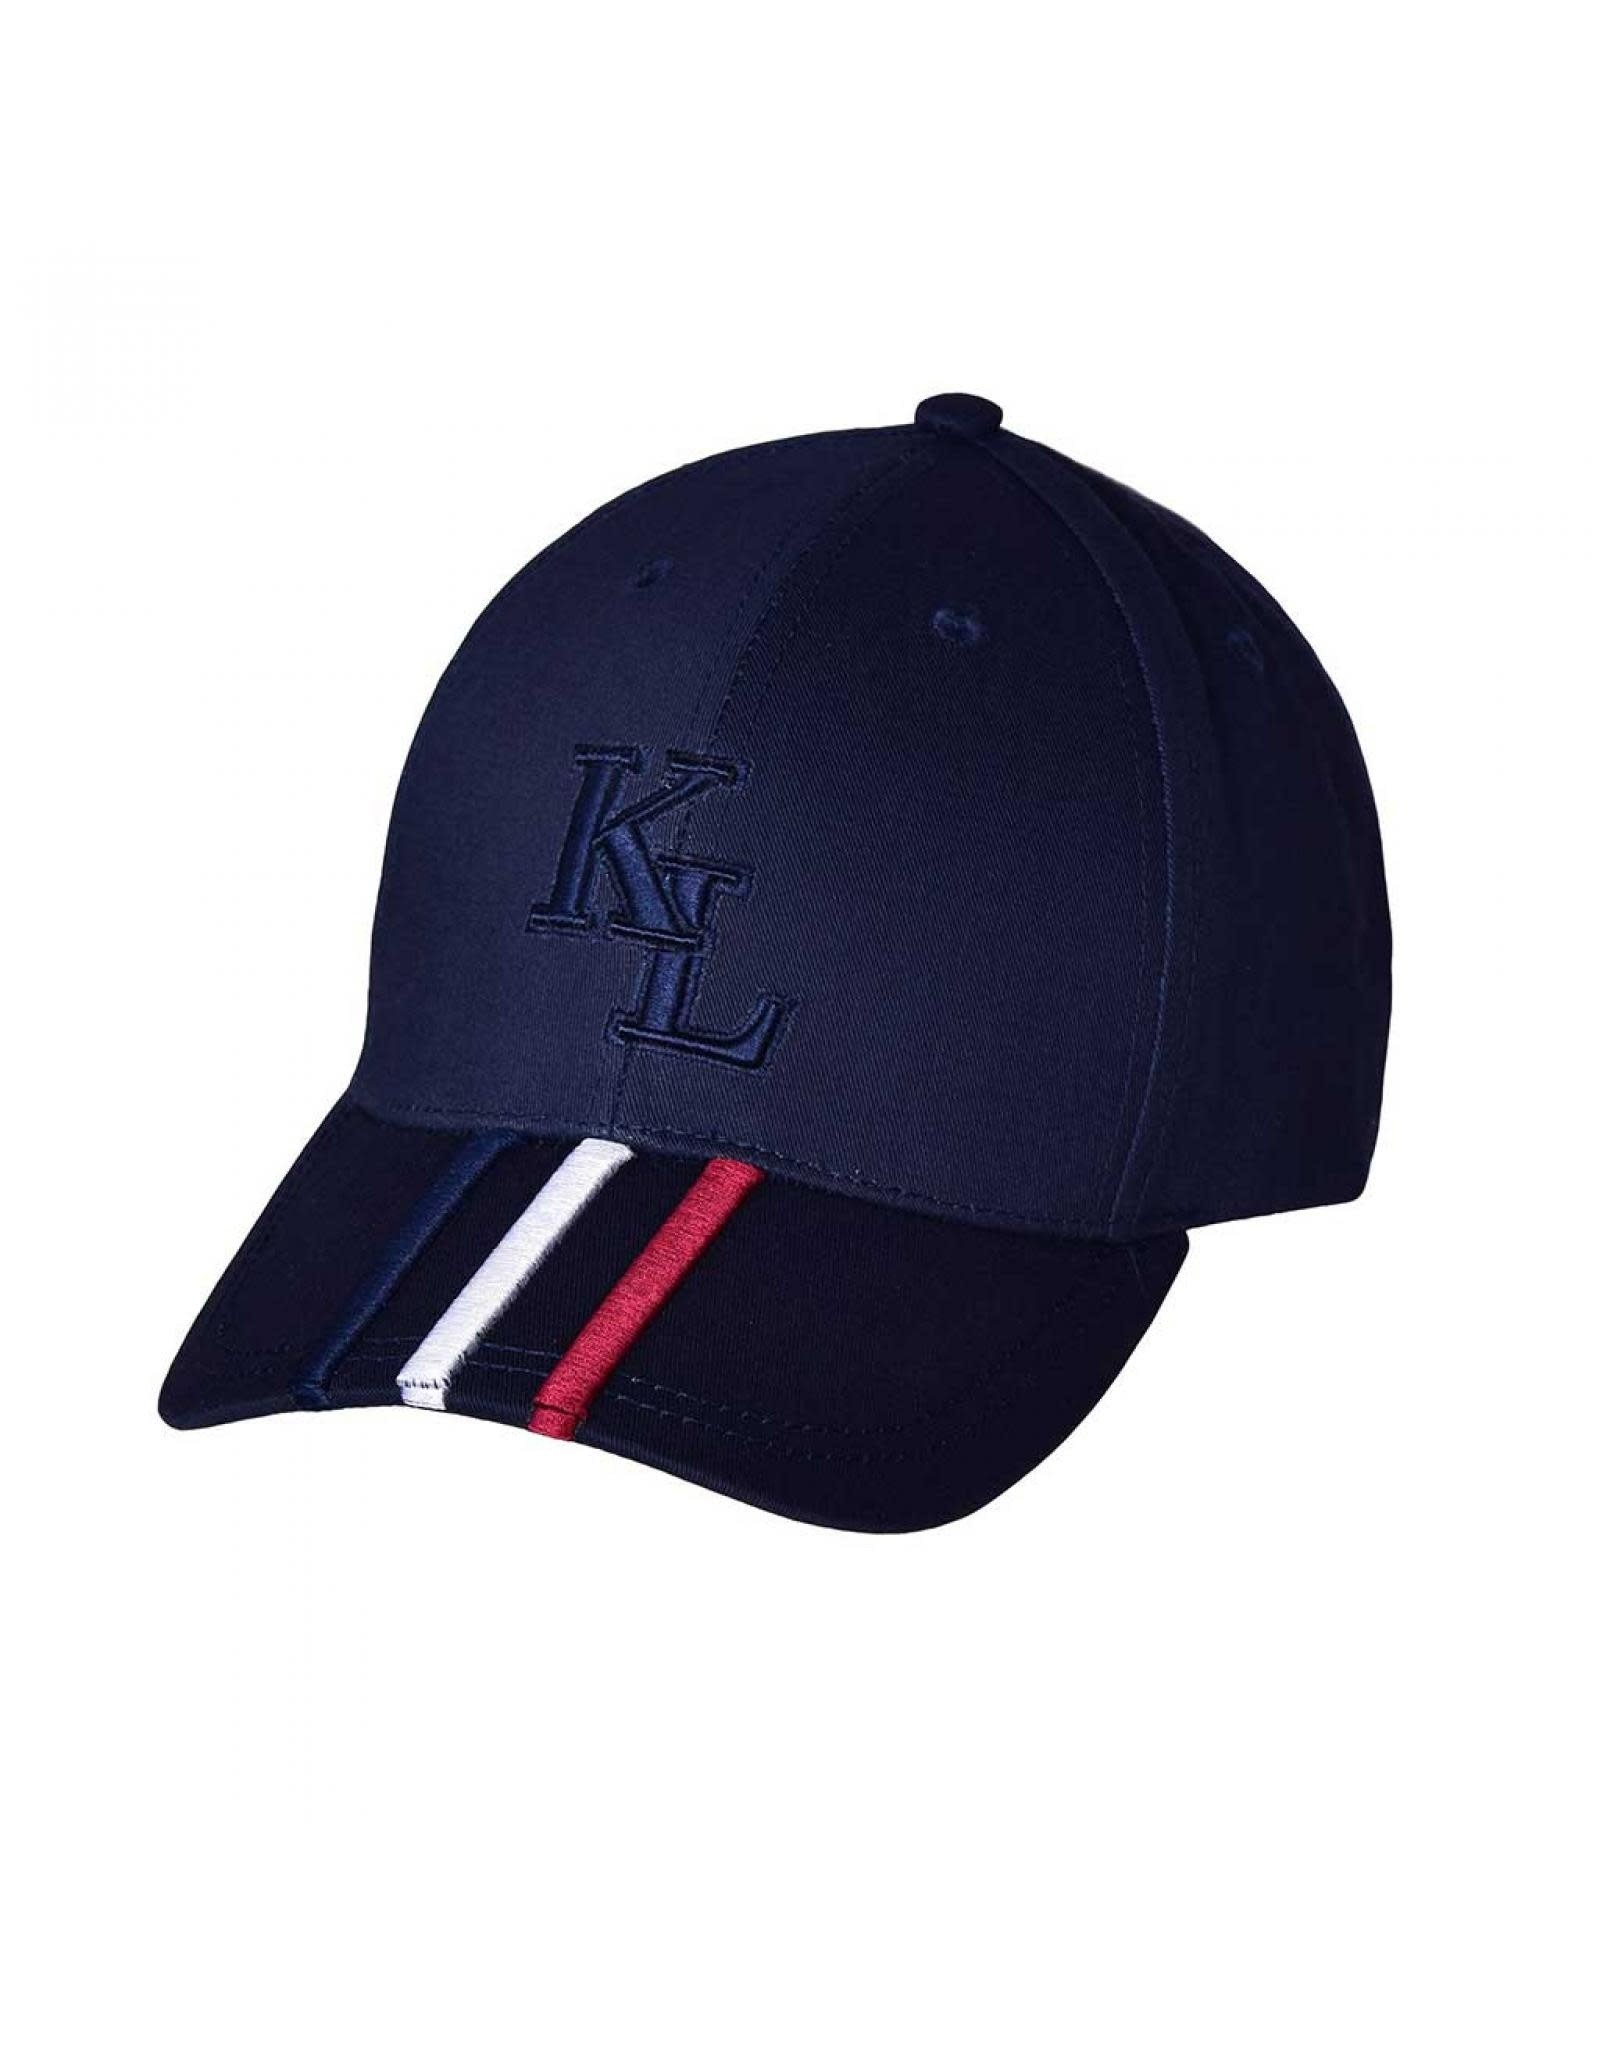 Kingsland KL Pet Jaden Navy